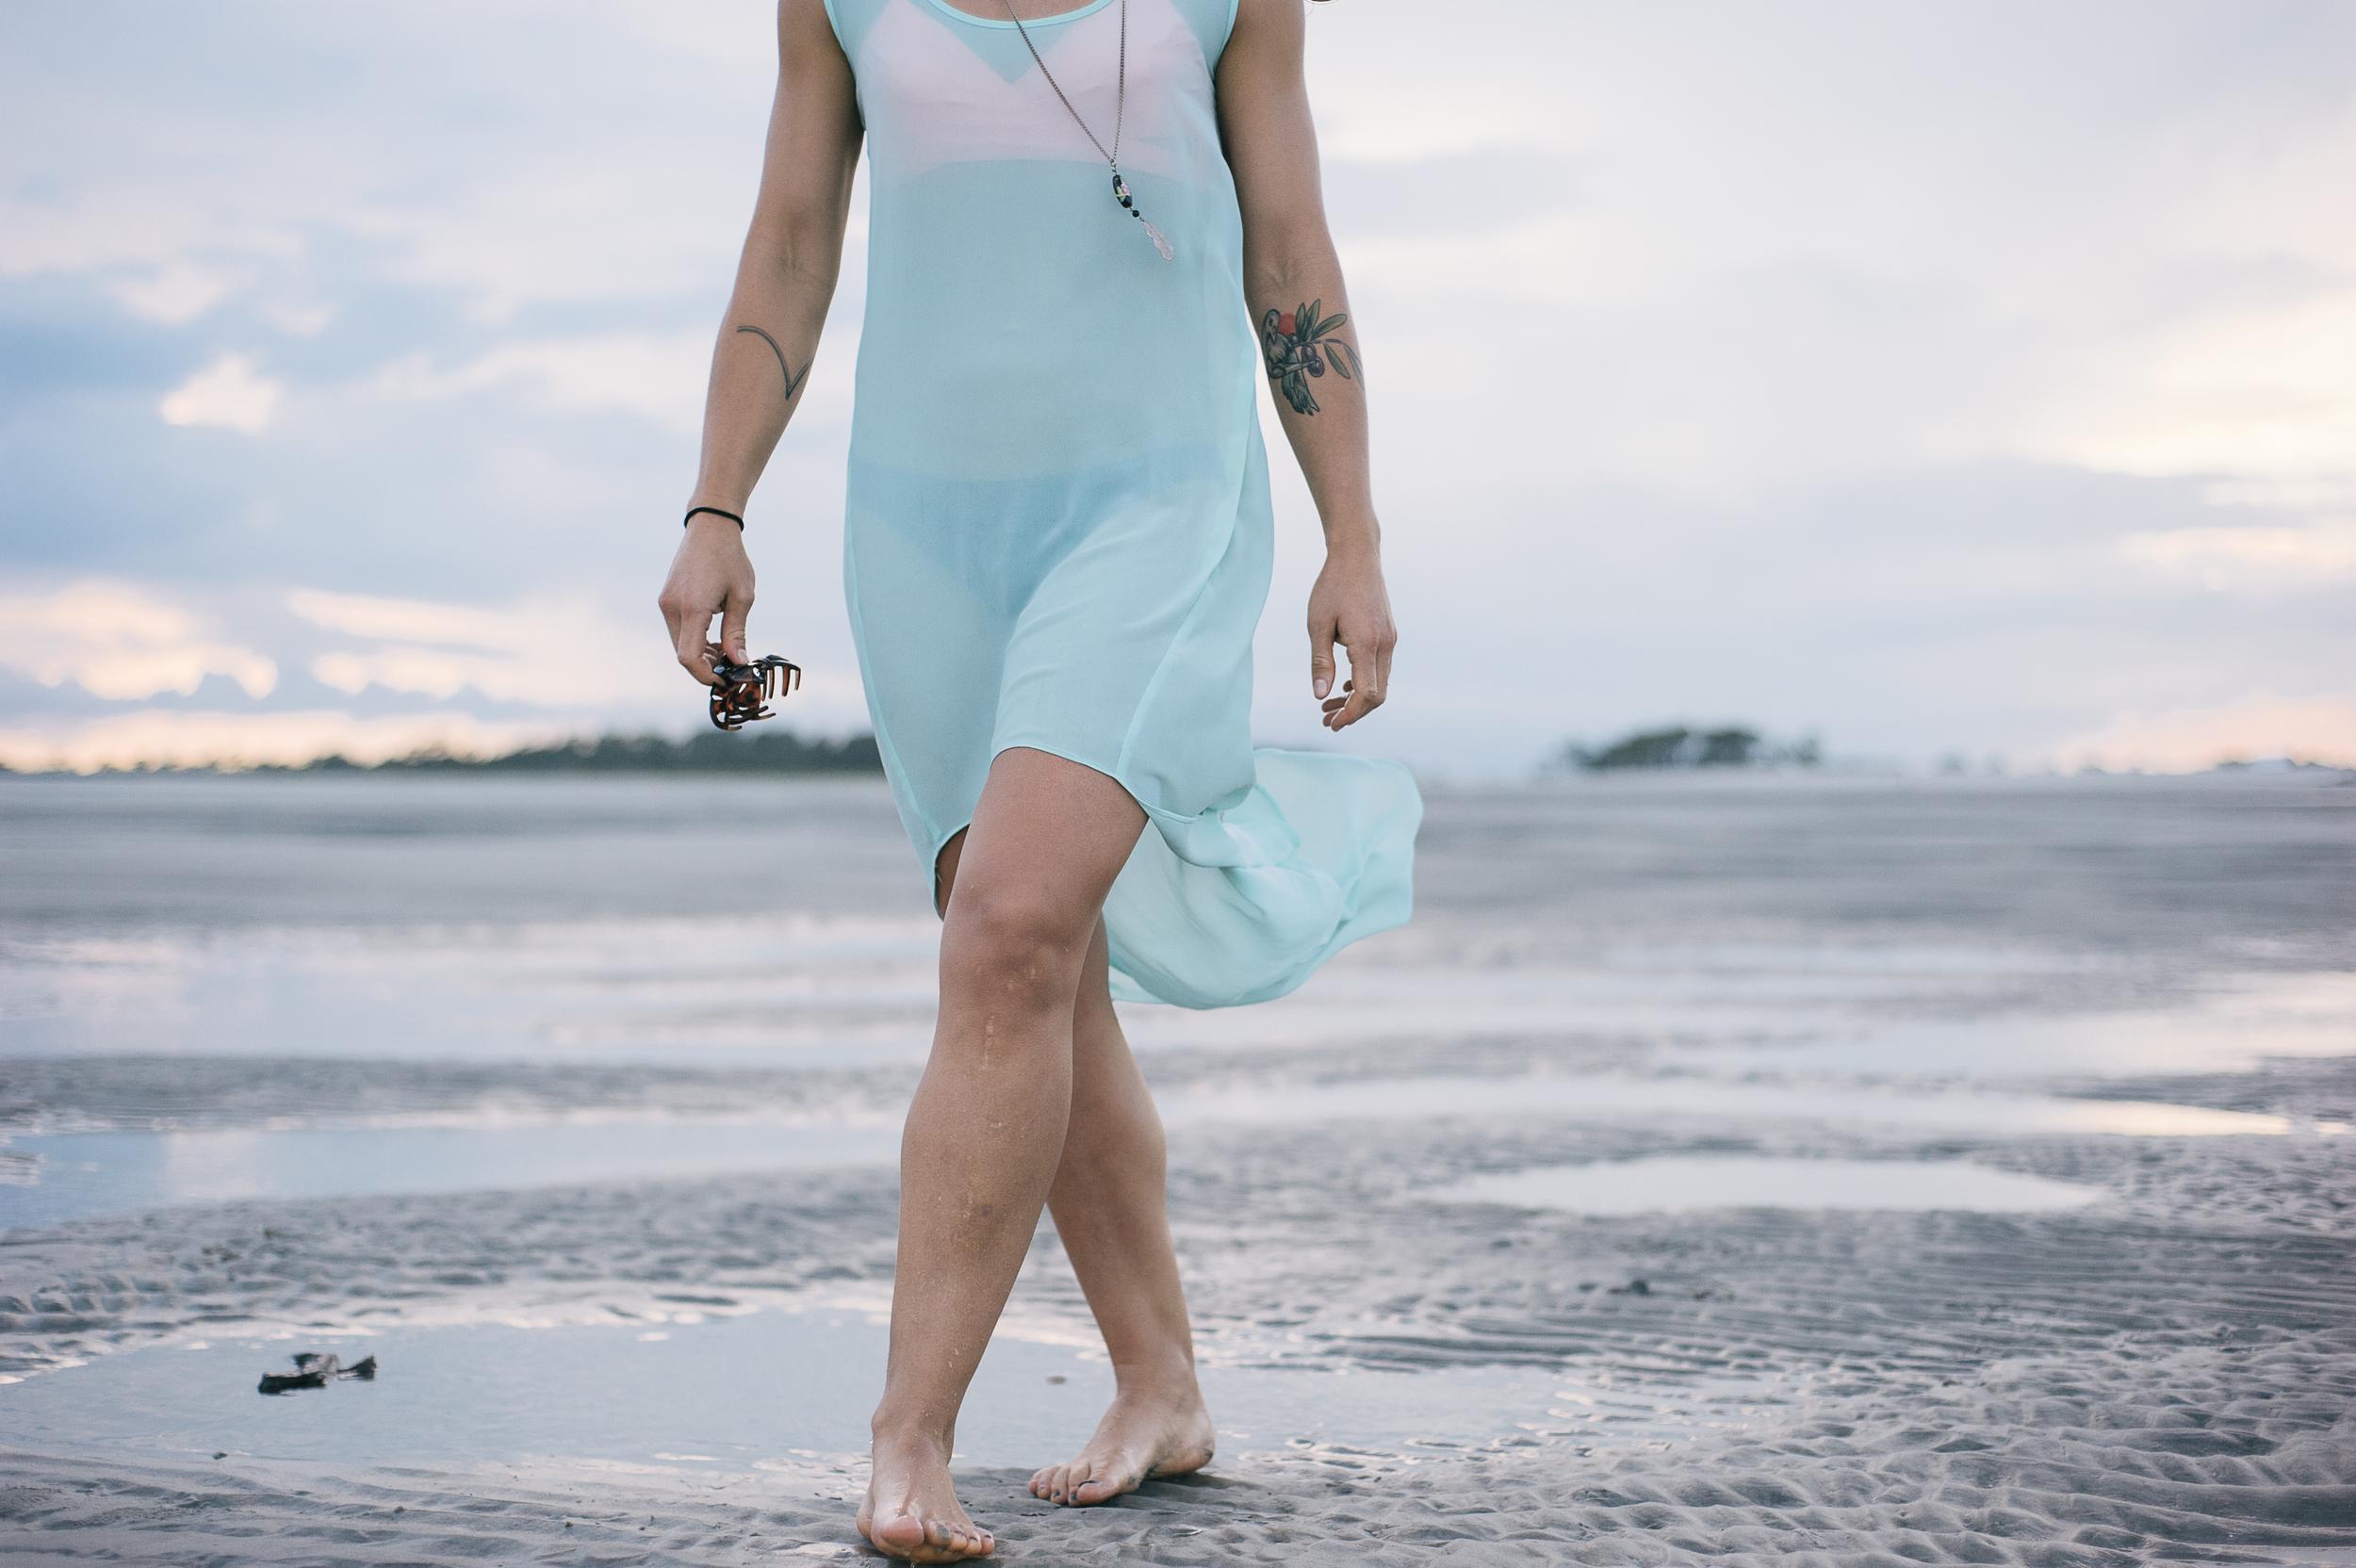 m.newsom-photography-savannah-wedding-photographer-tybee-island-photographer-kami-and-petra-july-2015 (46 of 230).jpg